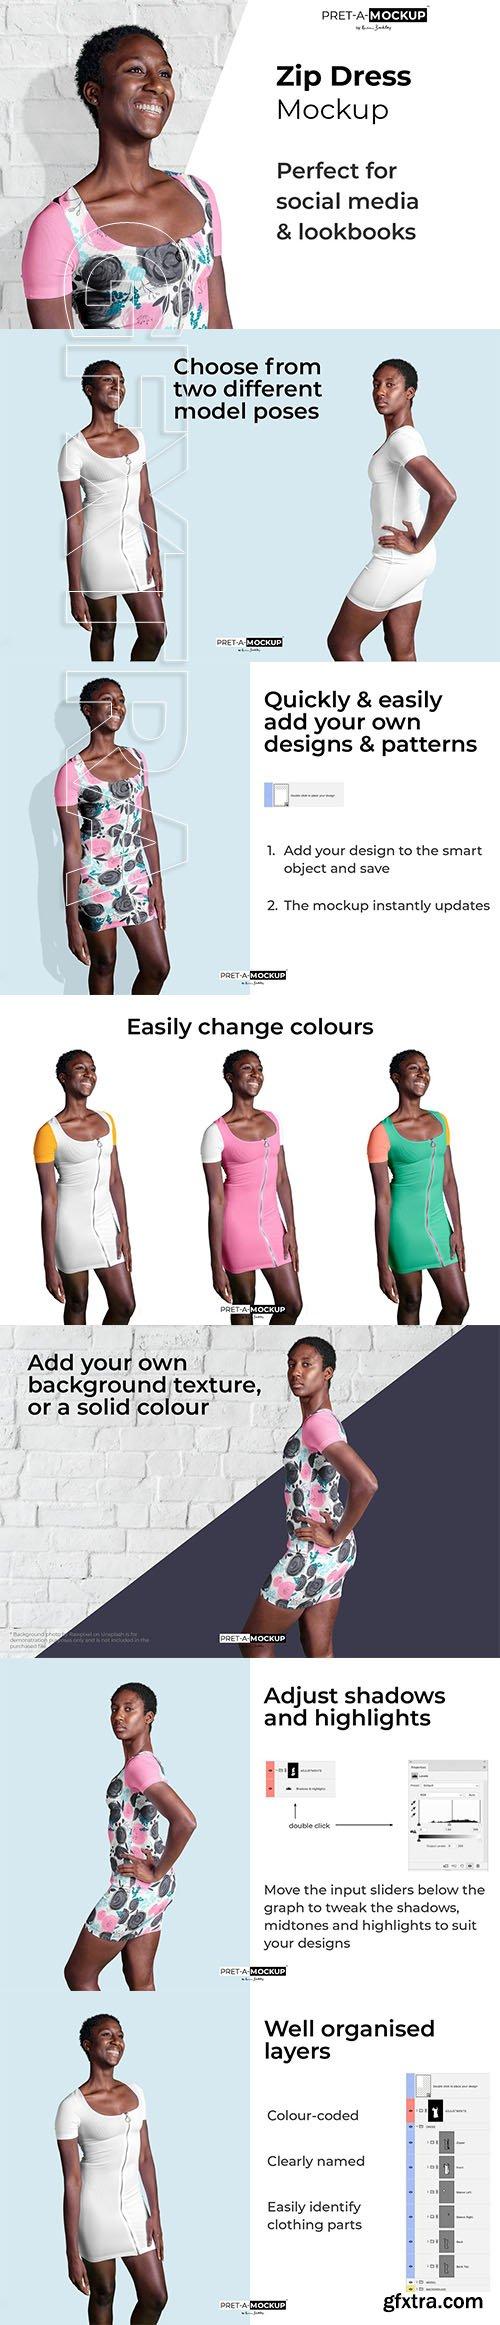 CreativeMarket - Zip Dress Mockup 3702444